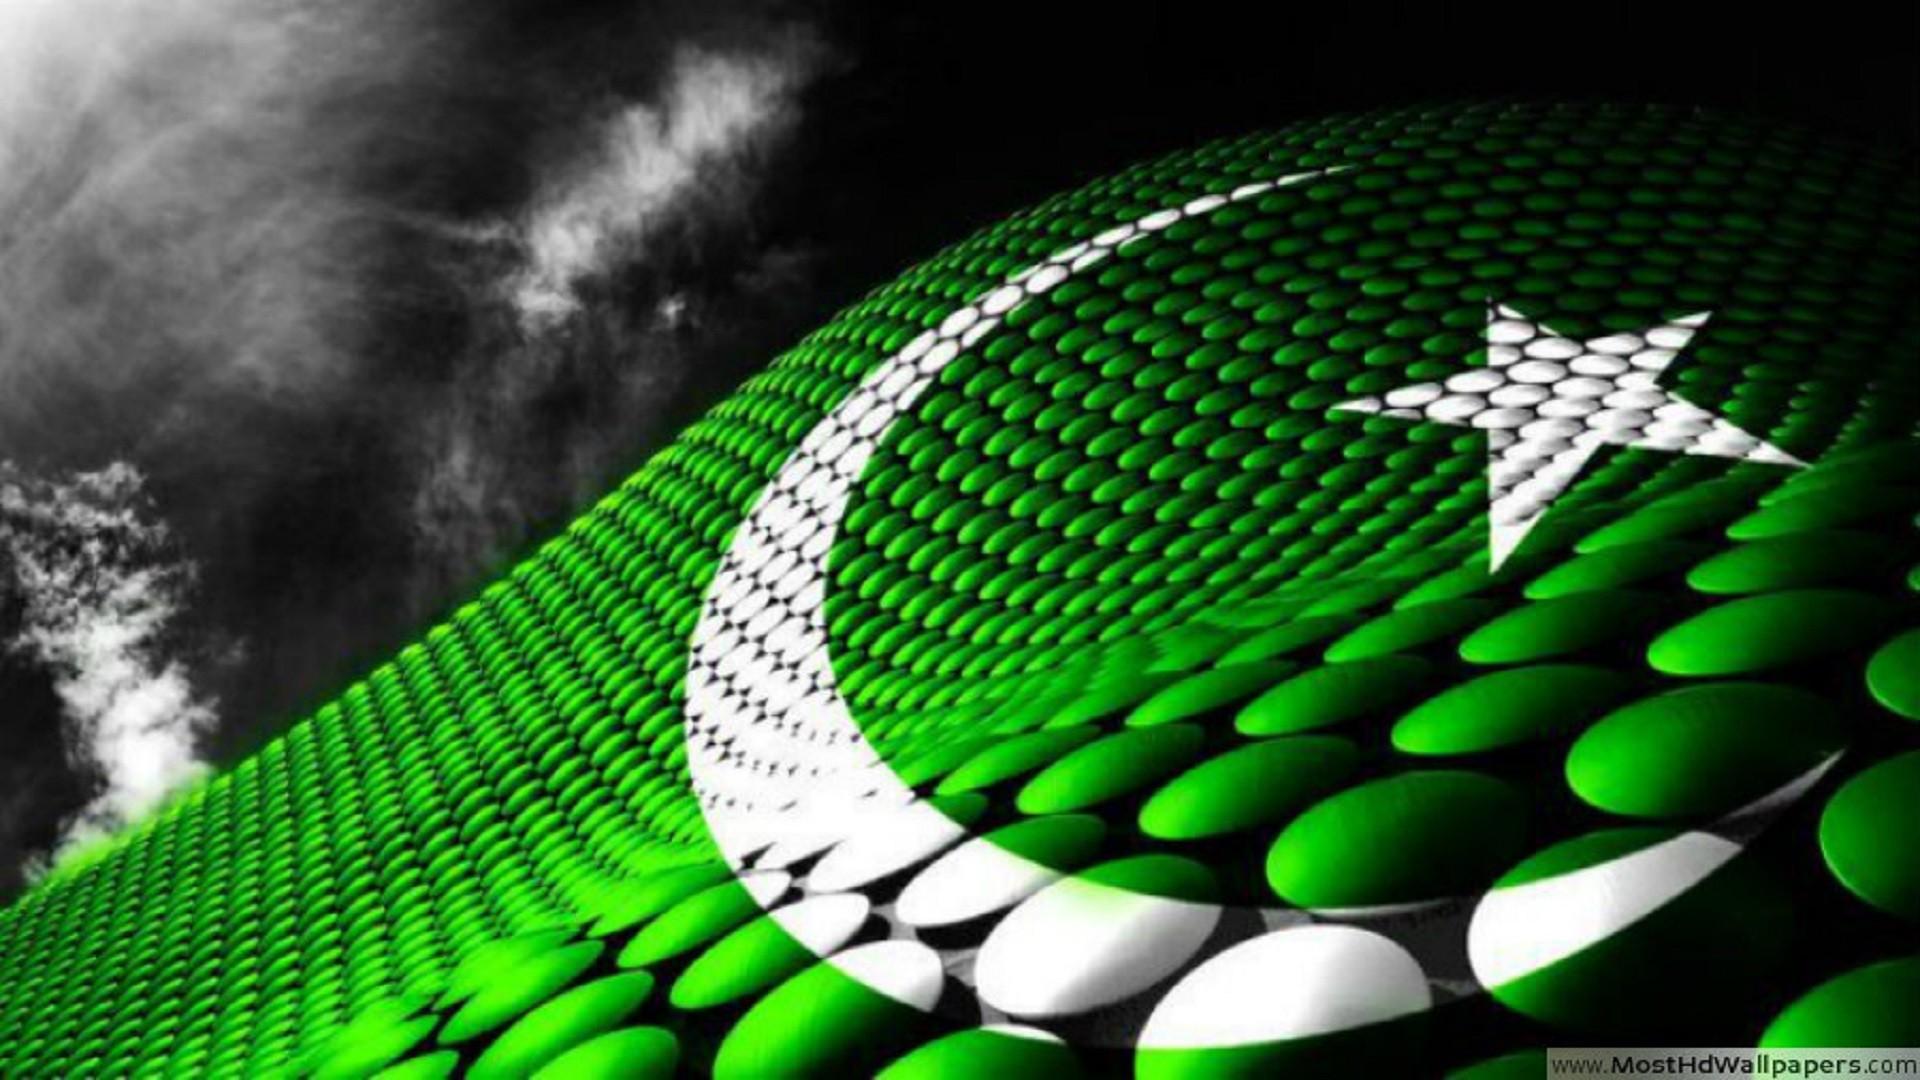 3d pakistan flag wallpaper 2018 top 10 60 images - Top hd wallpapers 2018 ...